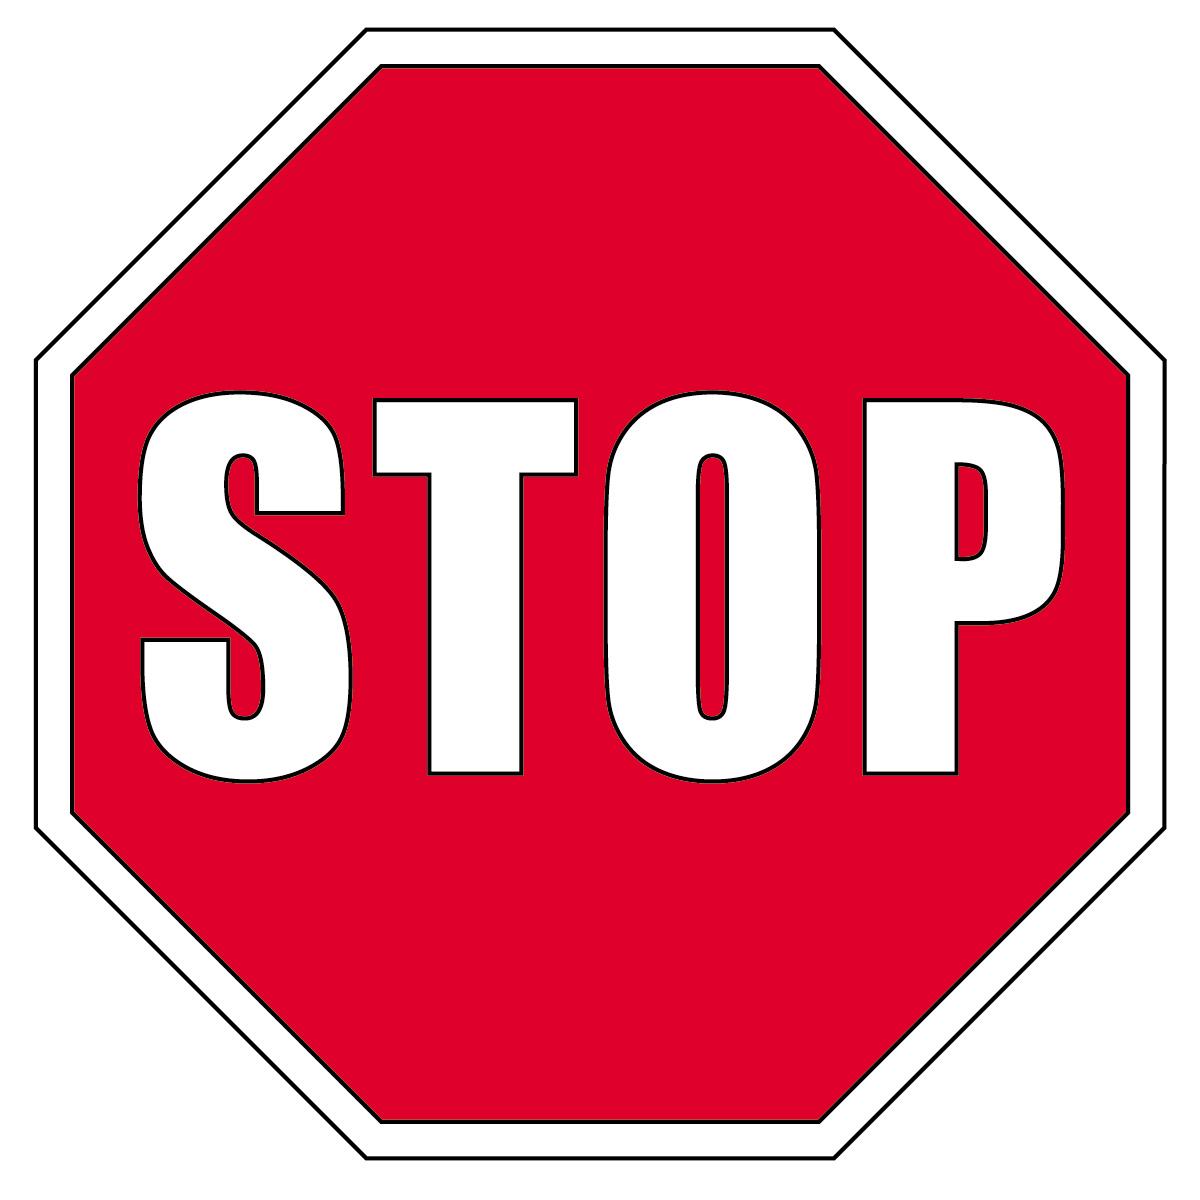 Stop sign clip art. Microsoft clipart panda free